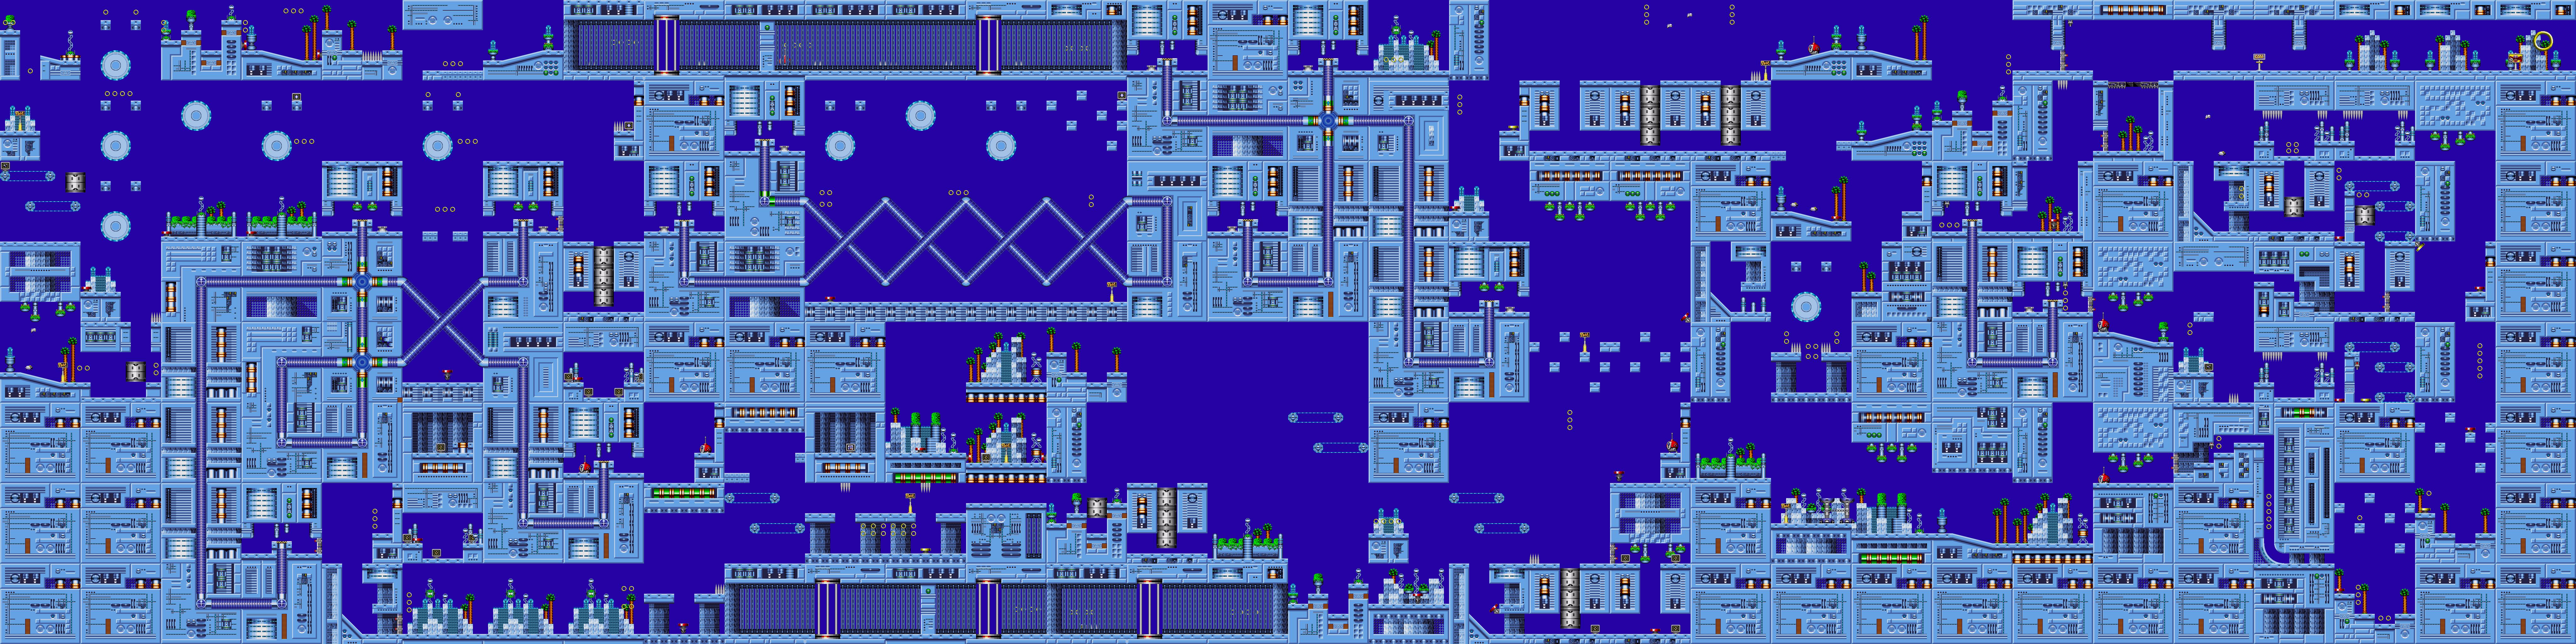 Sonic Cd Maps The Sonic Center